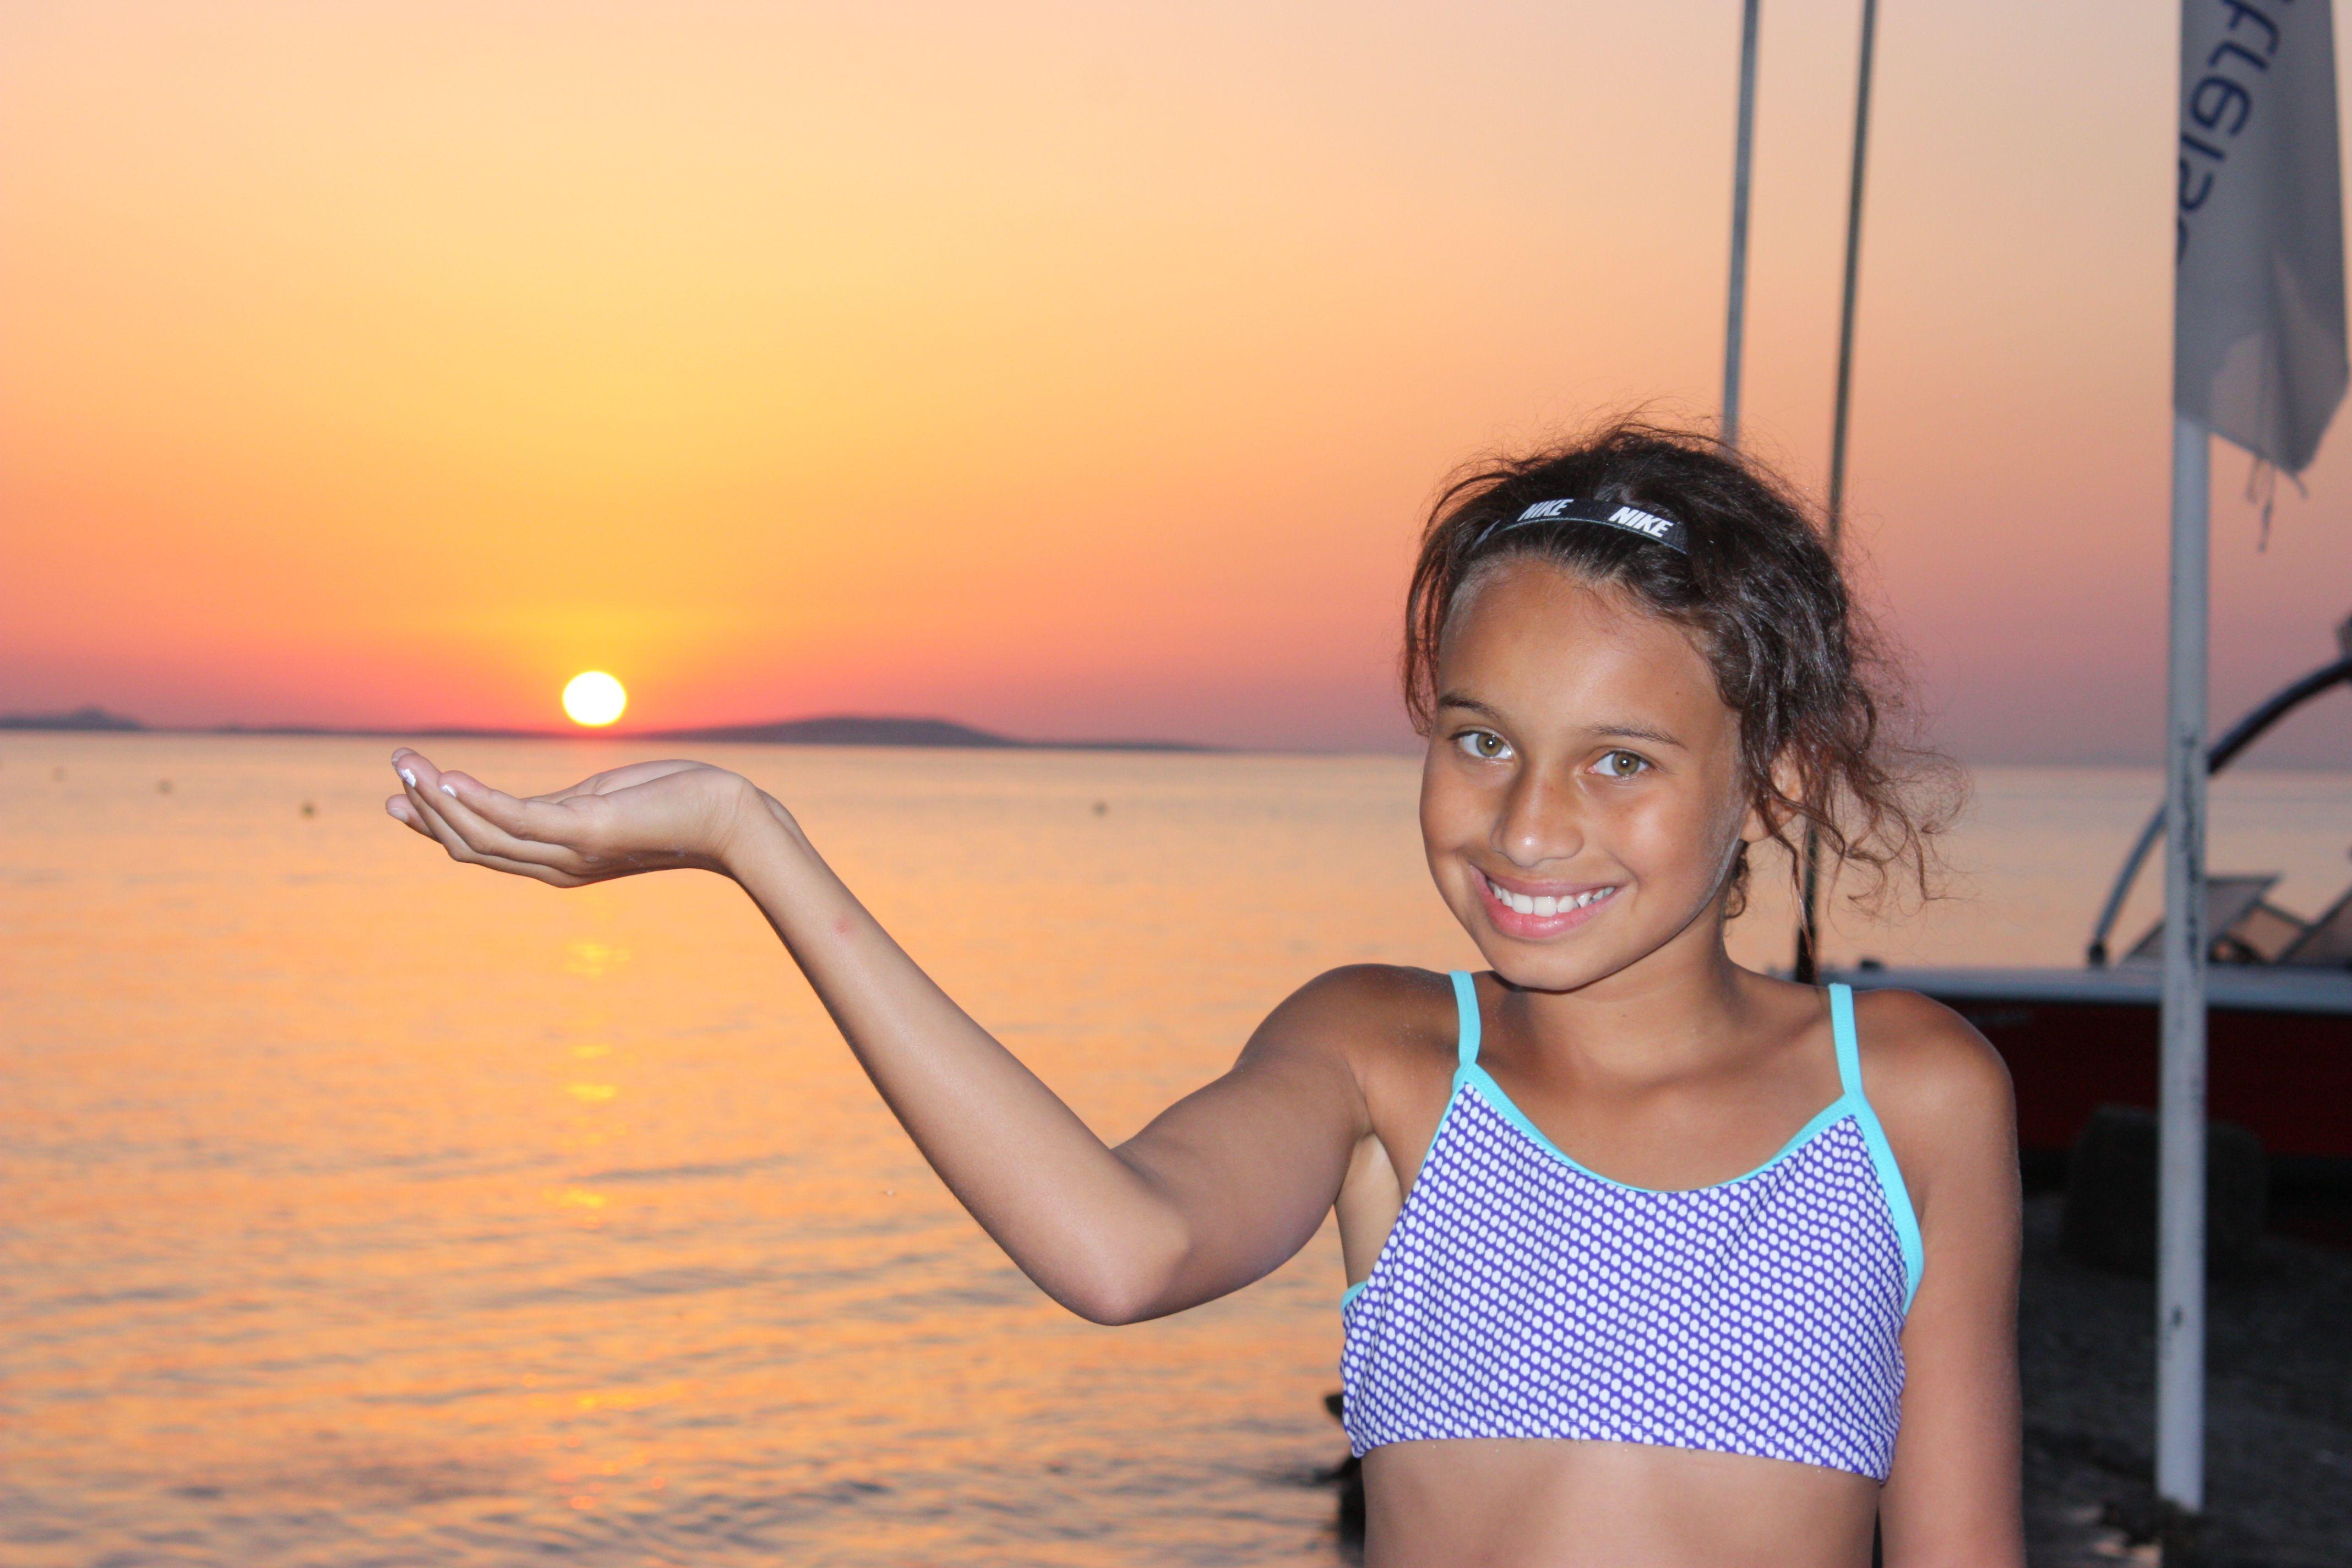 Catch the sunset....